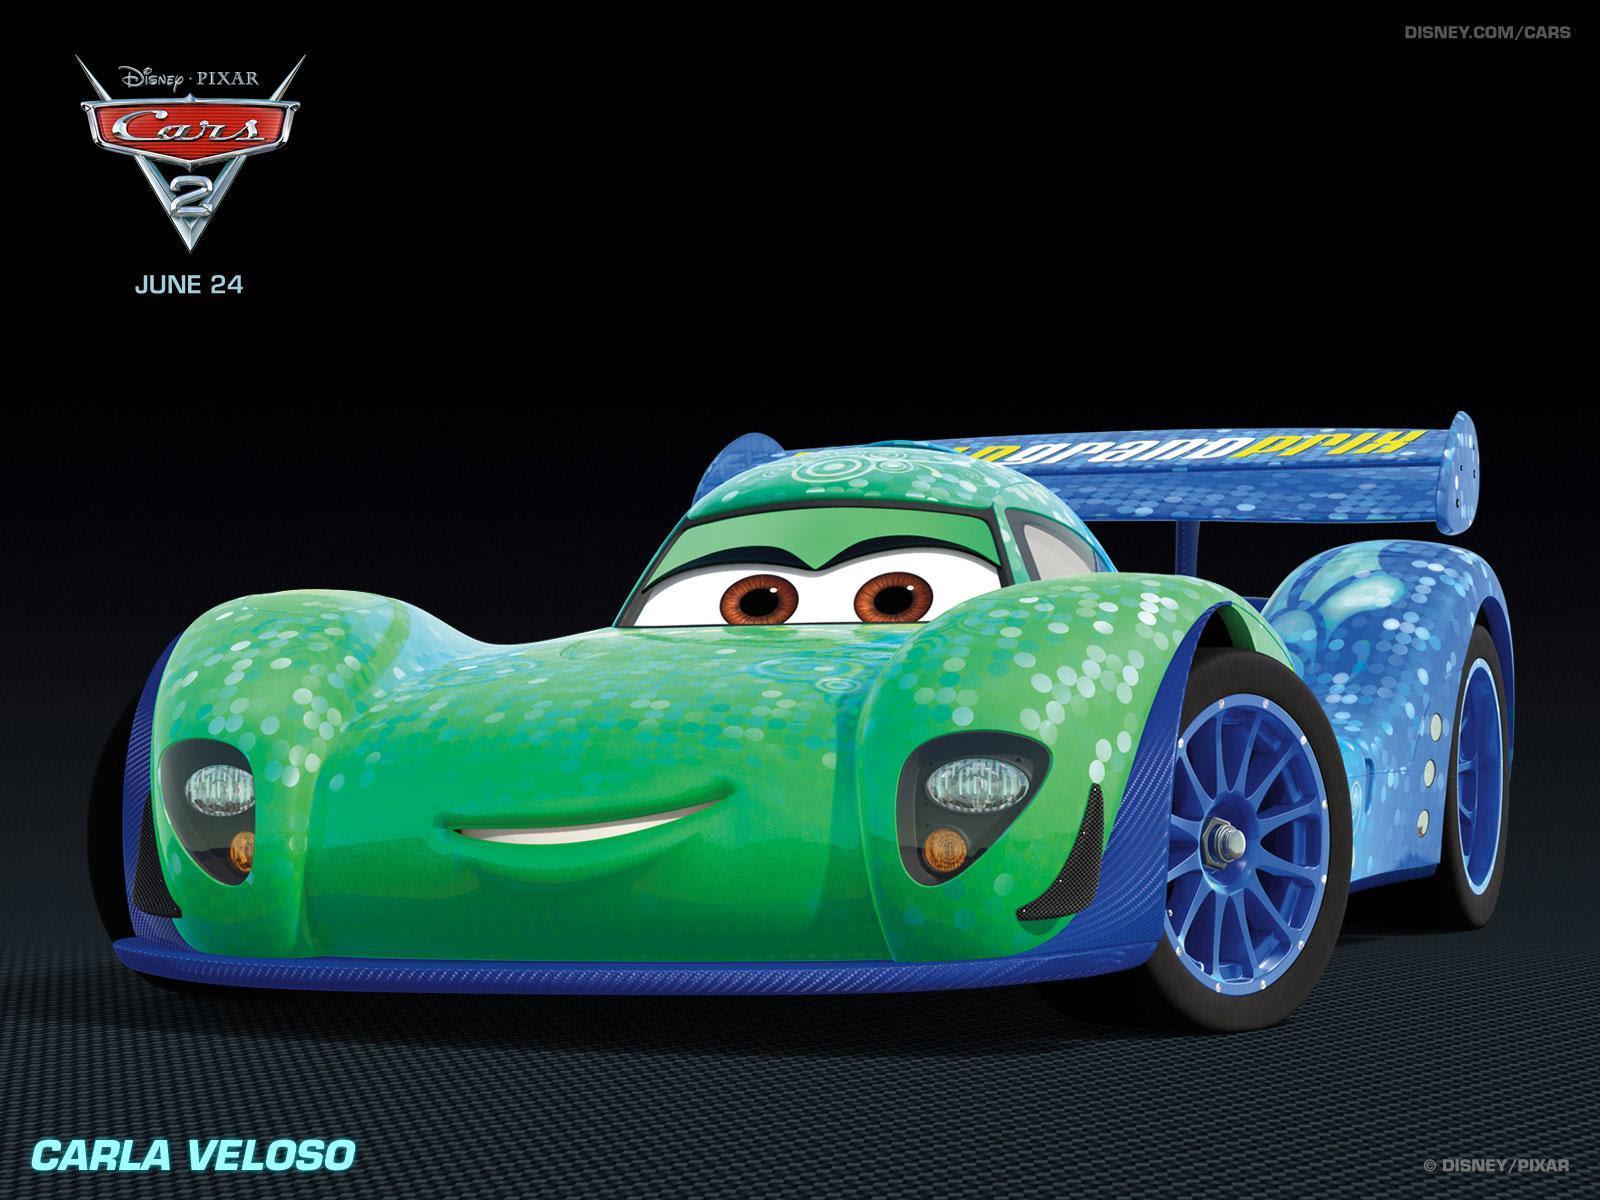 carla veloso cars 2 HD desktop wallpaper : Widescreen ...